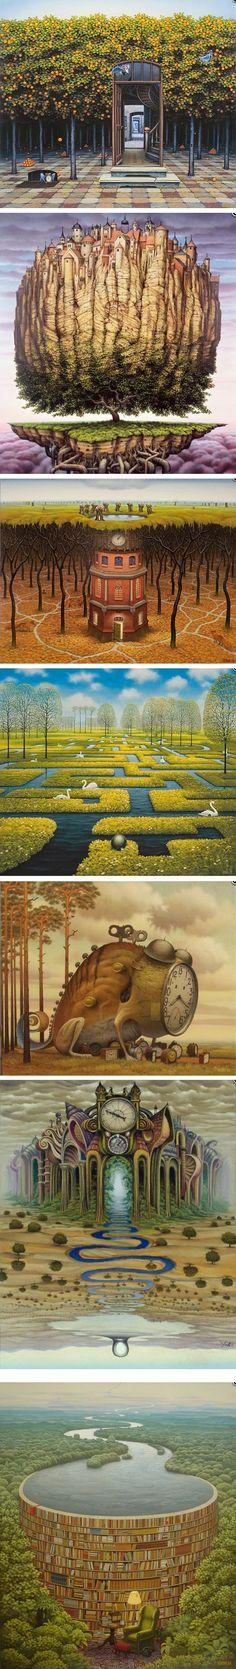 Jacek Yerka 야첵 예르카. 초현실주의 작가. 공간의 왜곡, 비현실적인 공간 사용 투시법 파괴 결과적으로 환상적인 공간, 꿈꾸는 듯한 장면을 연출해냄 하지만 묘사는 사실적임. 환상적 공간에 사실적 묘사는 자칫 징그러워질 수 있으니 주의하자. 키워드 #환상적인 공간 #초현실주의